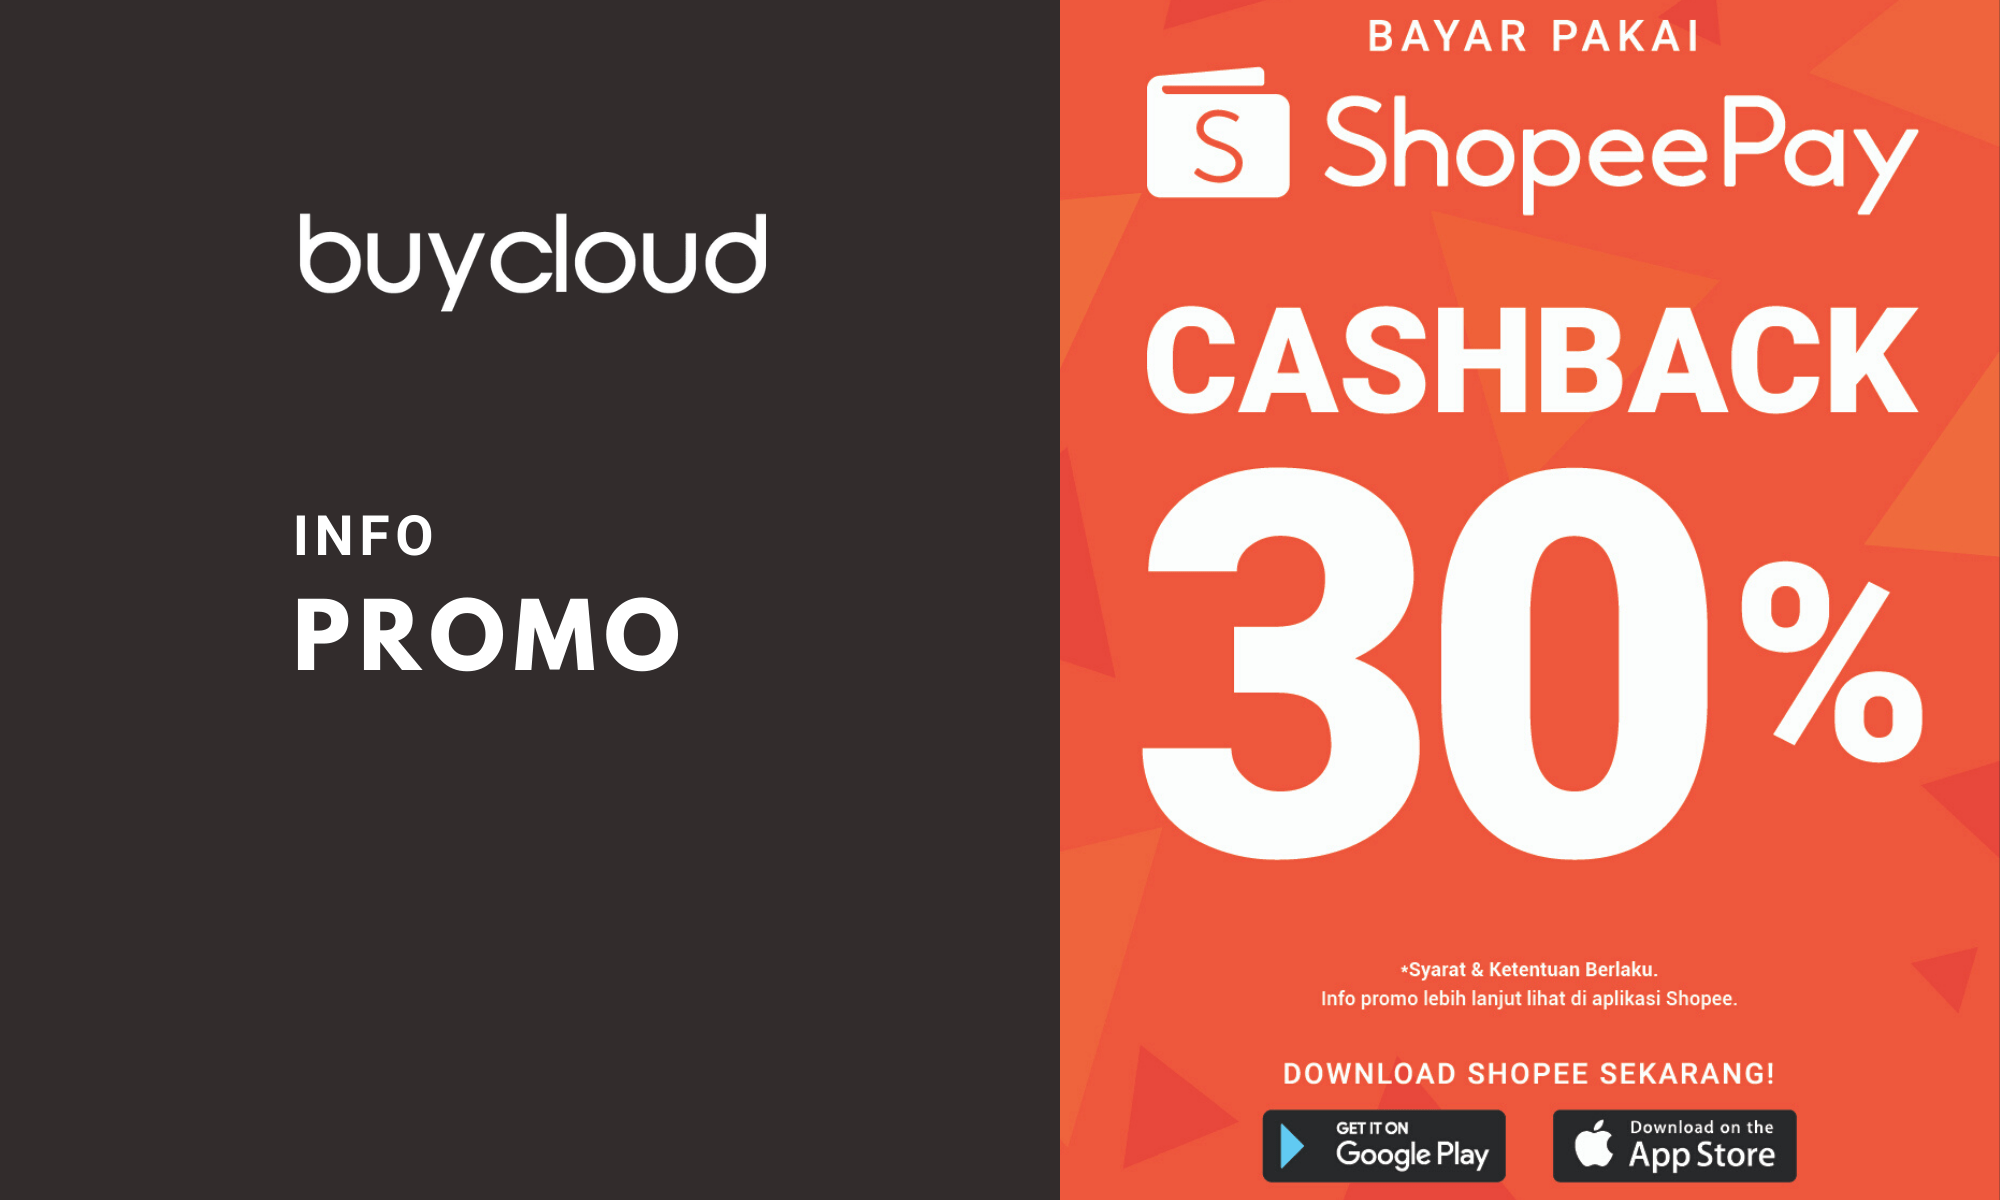 Promo BuyCloud Cachback 30% Pakai ShopeePay